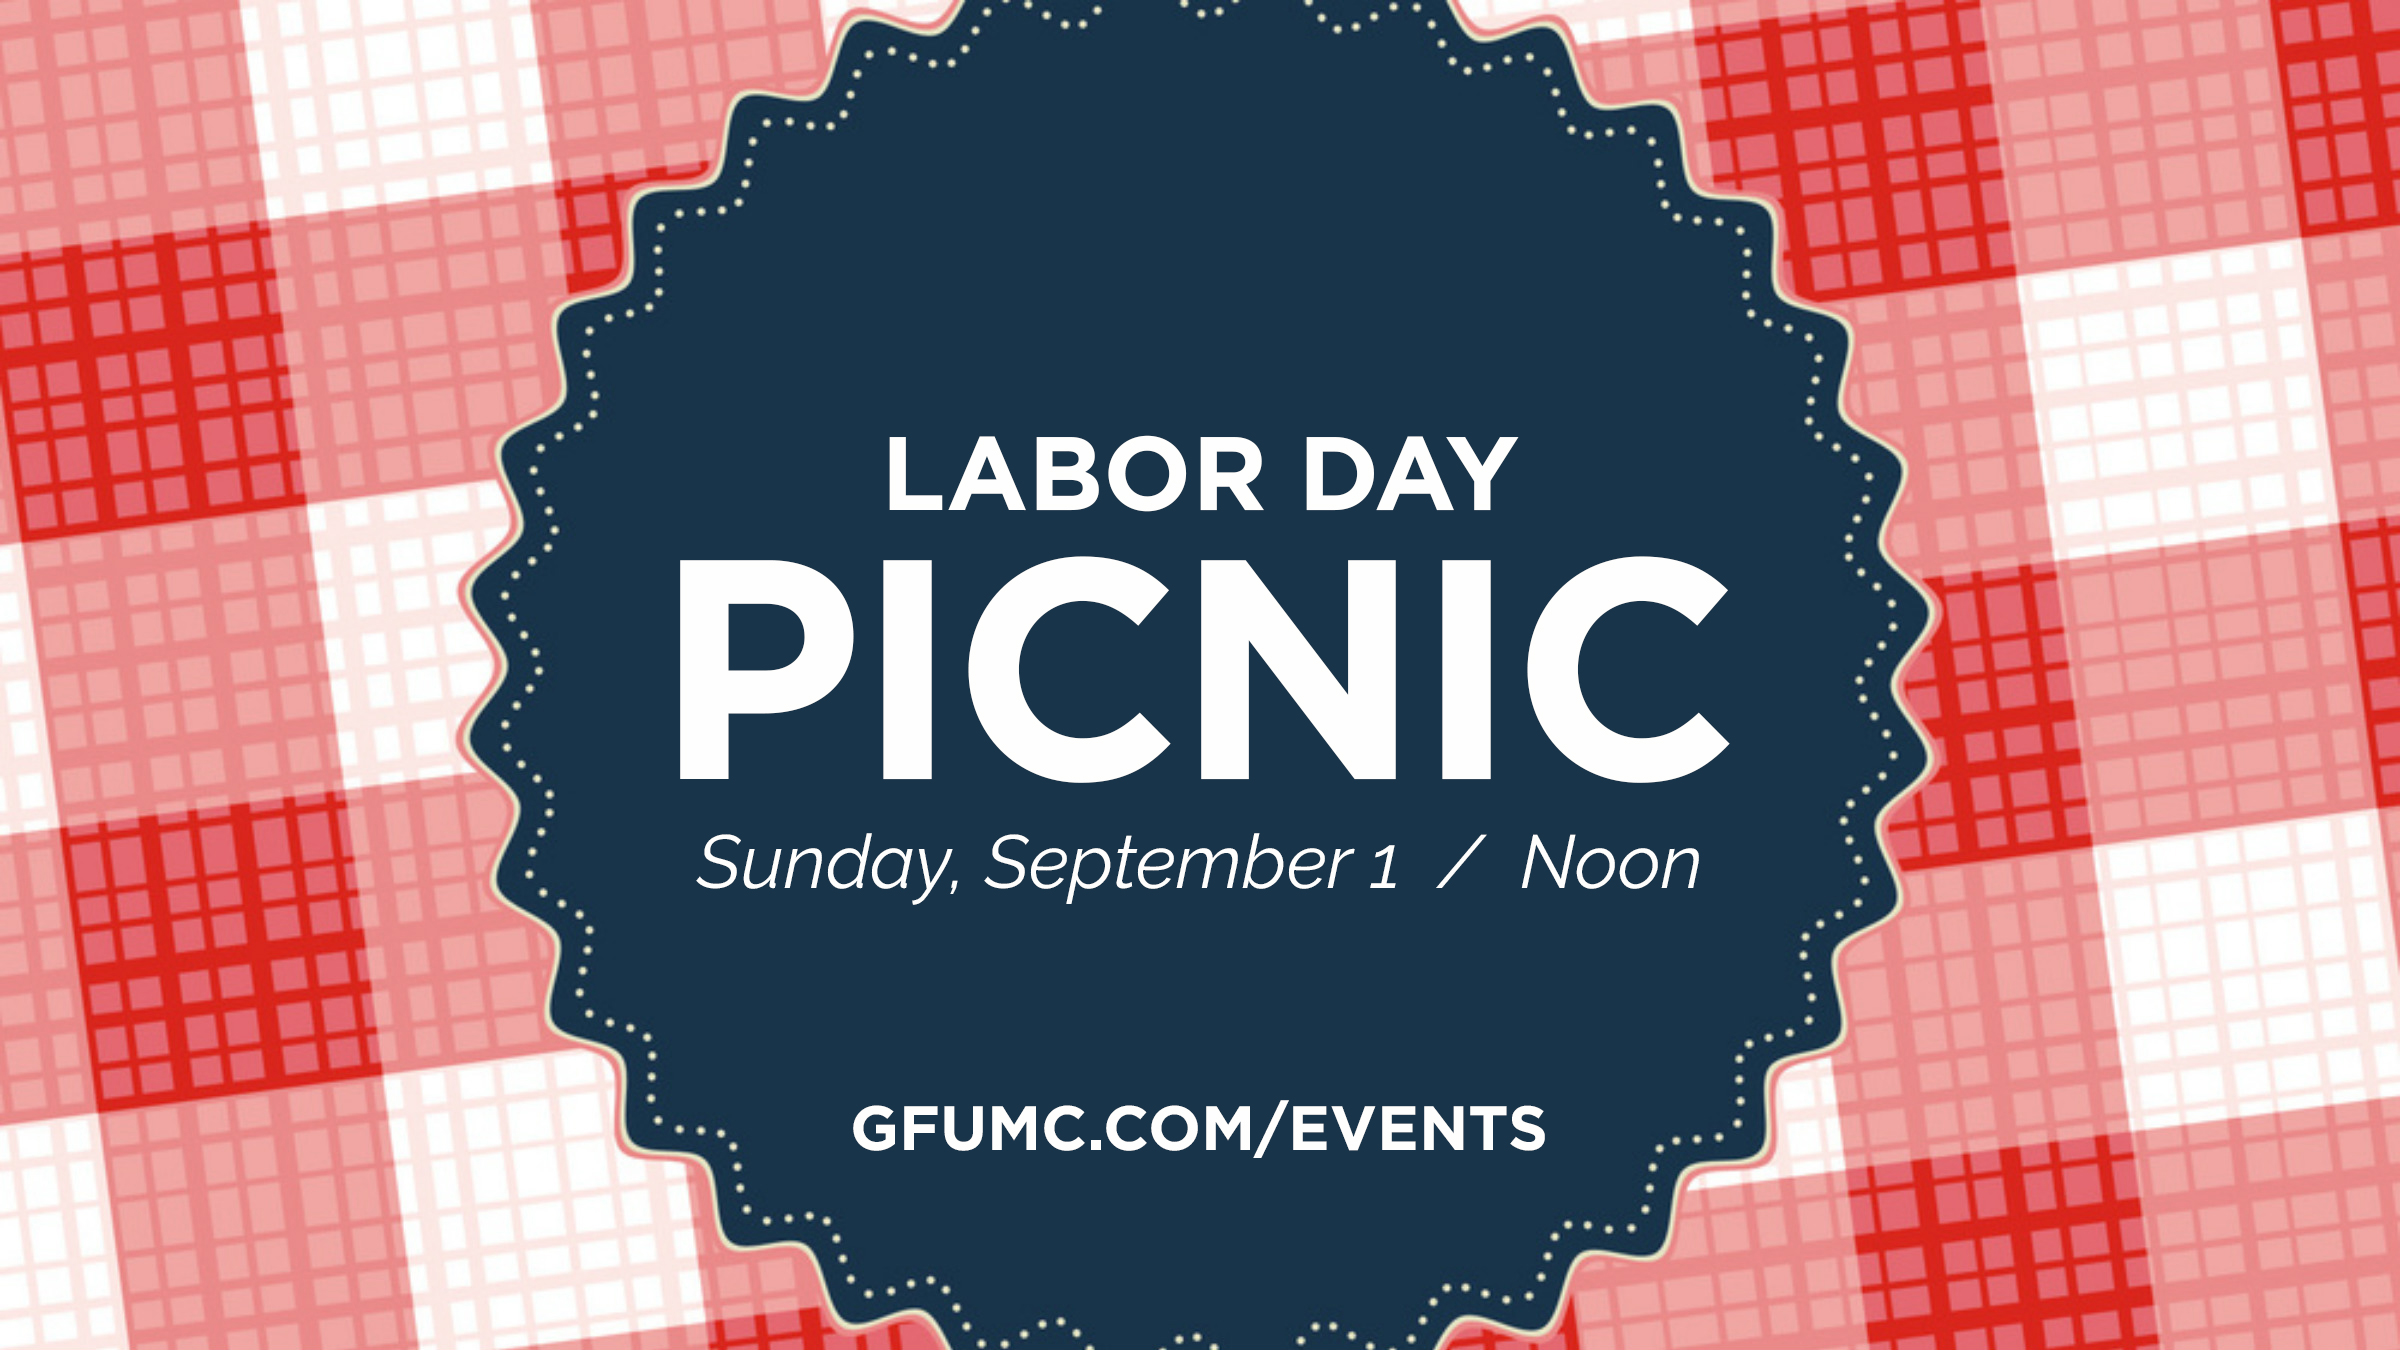 screen_labor_day_picnic_2019.jpg